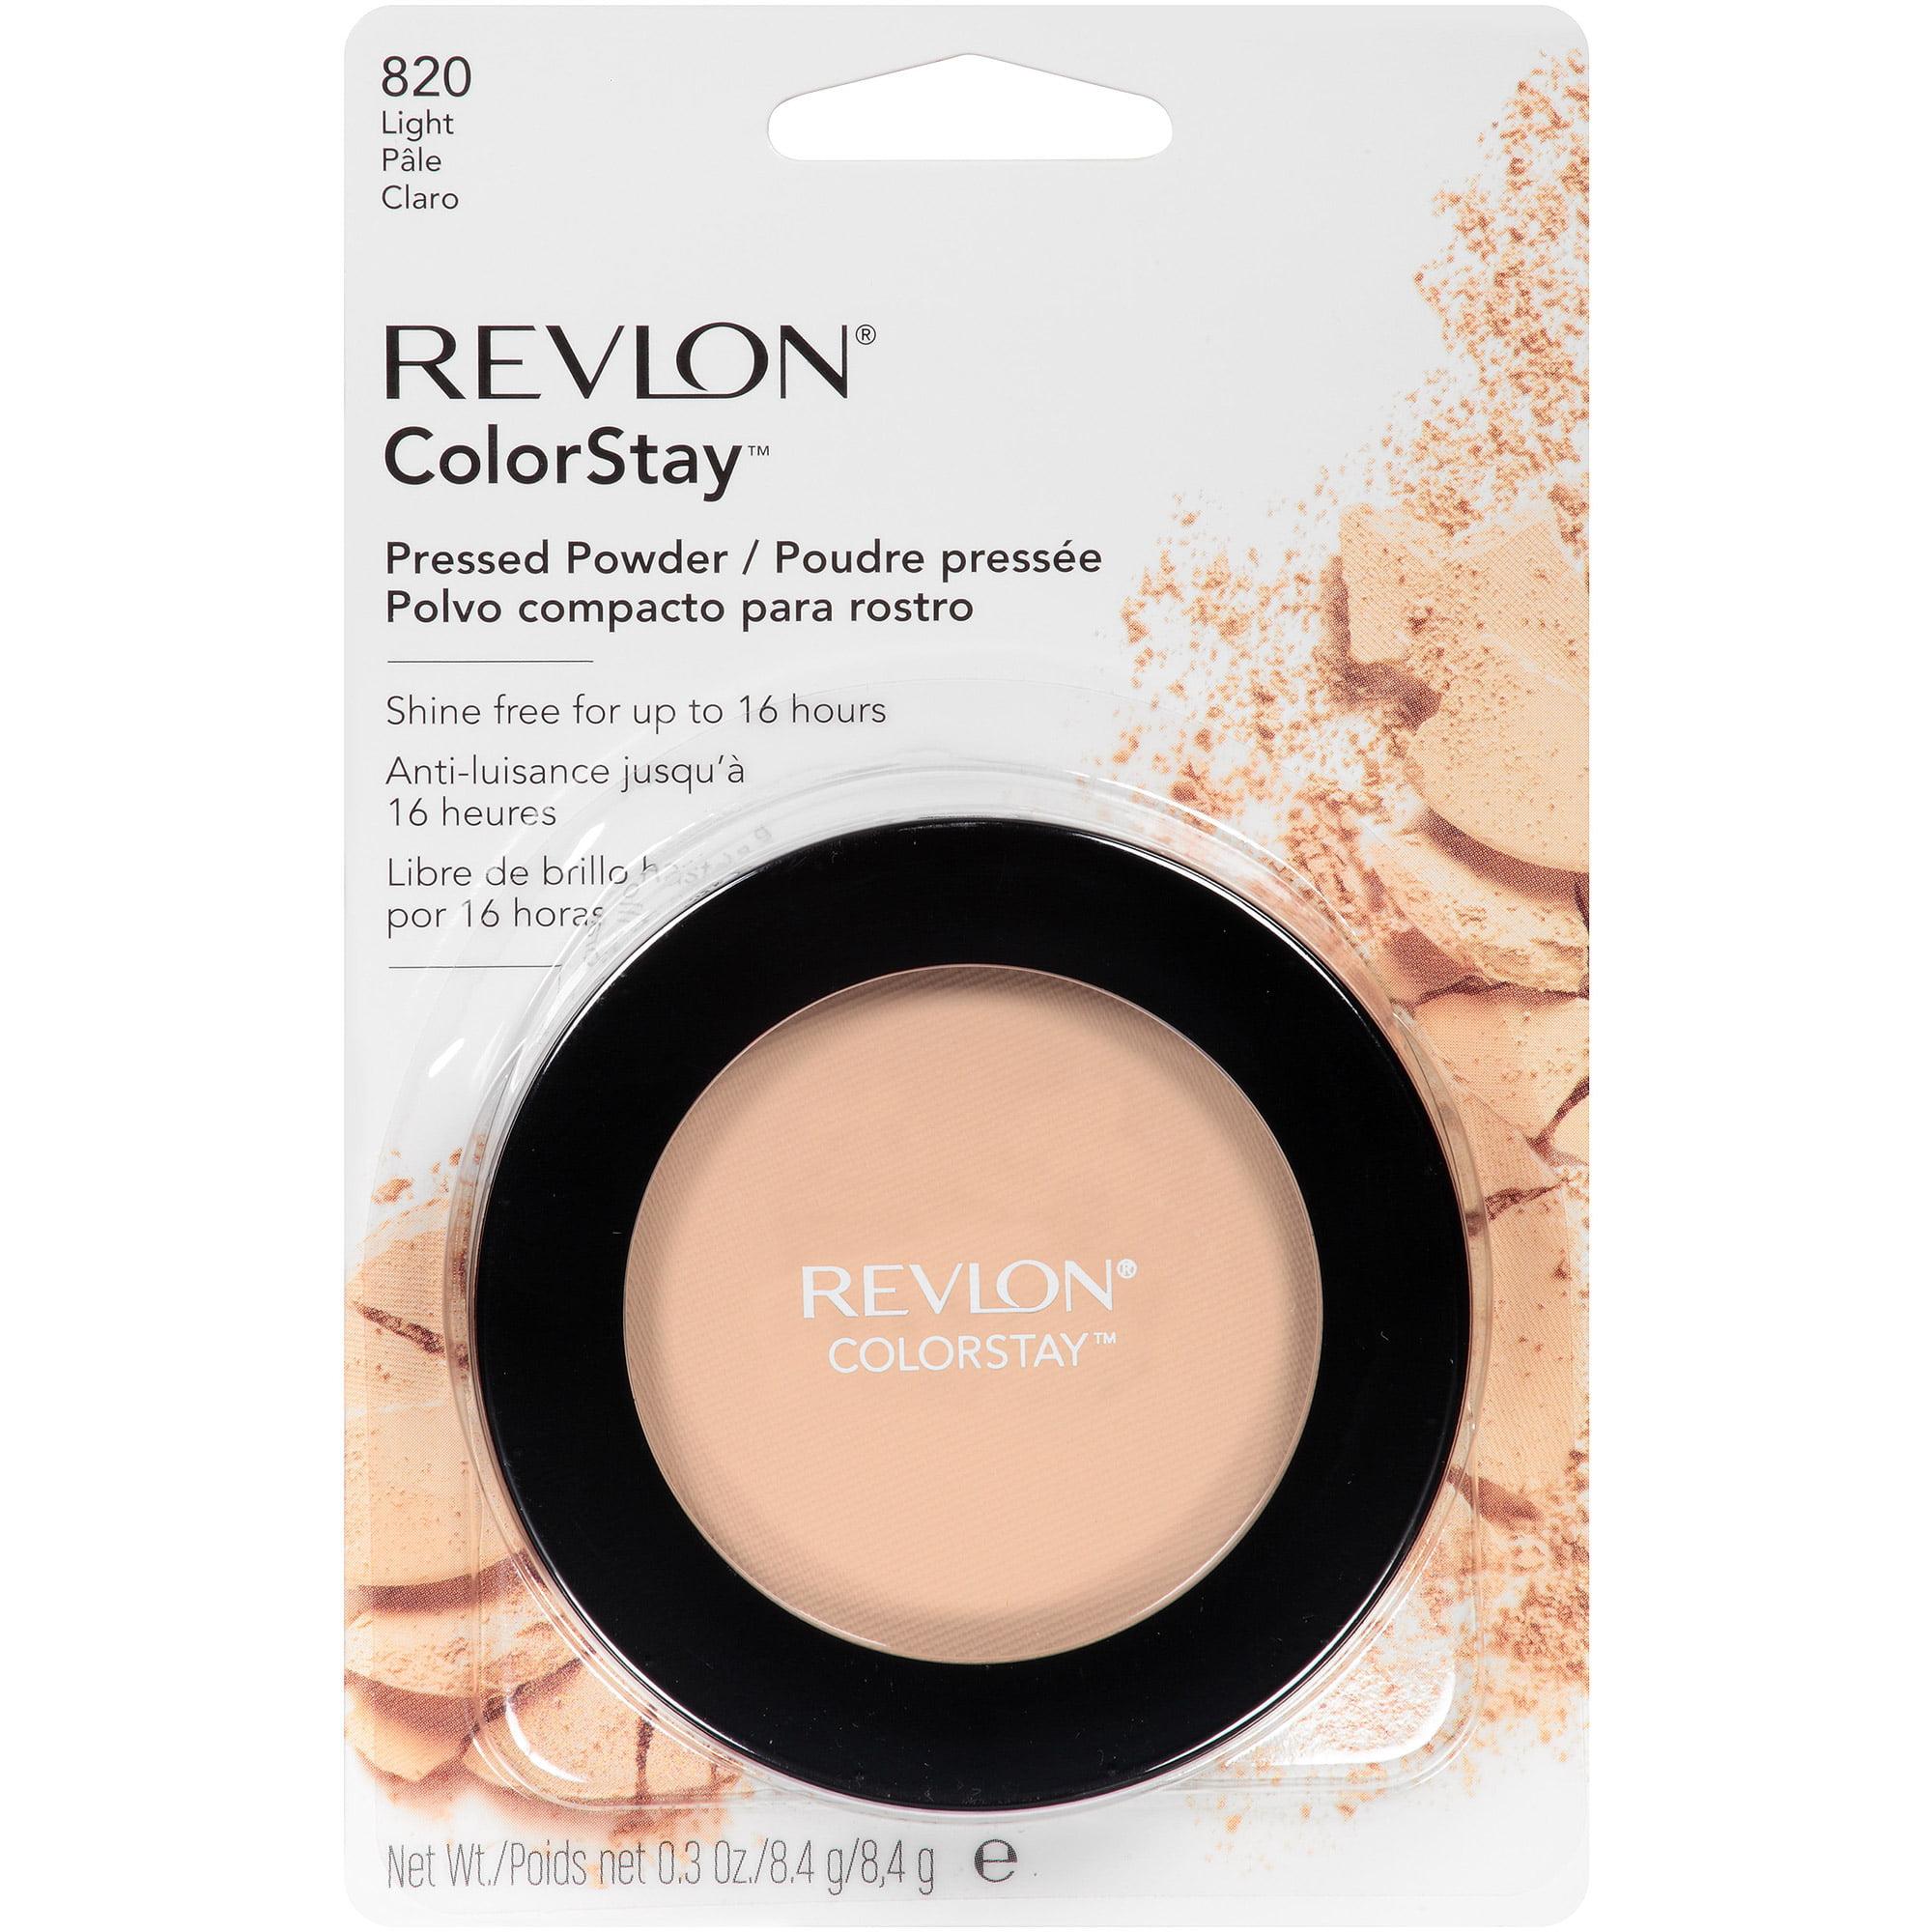 Revlon ColorStay Pressed Powder, 820 Light, 0.3 oz